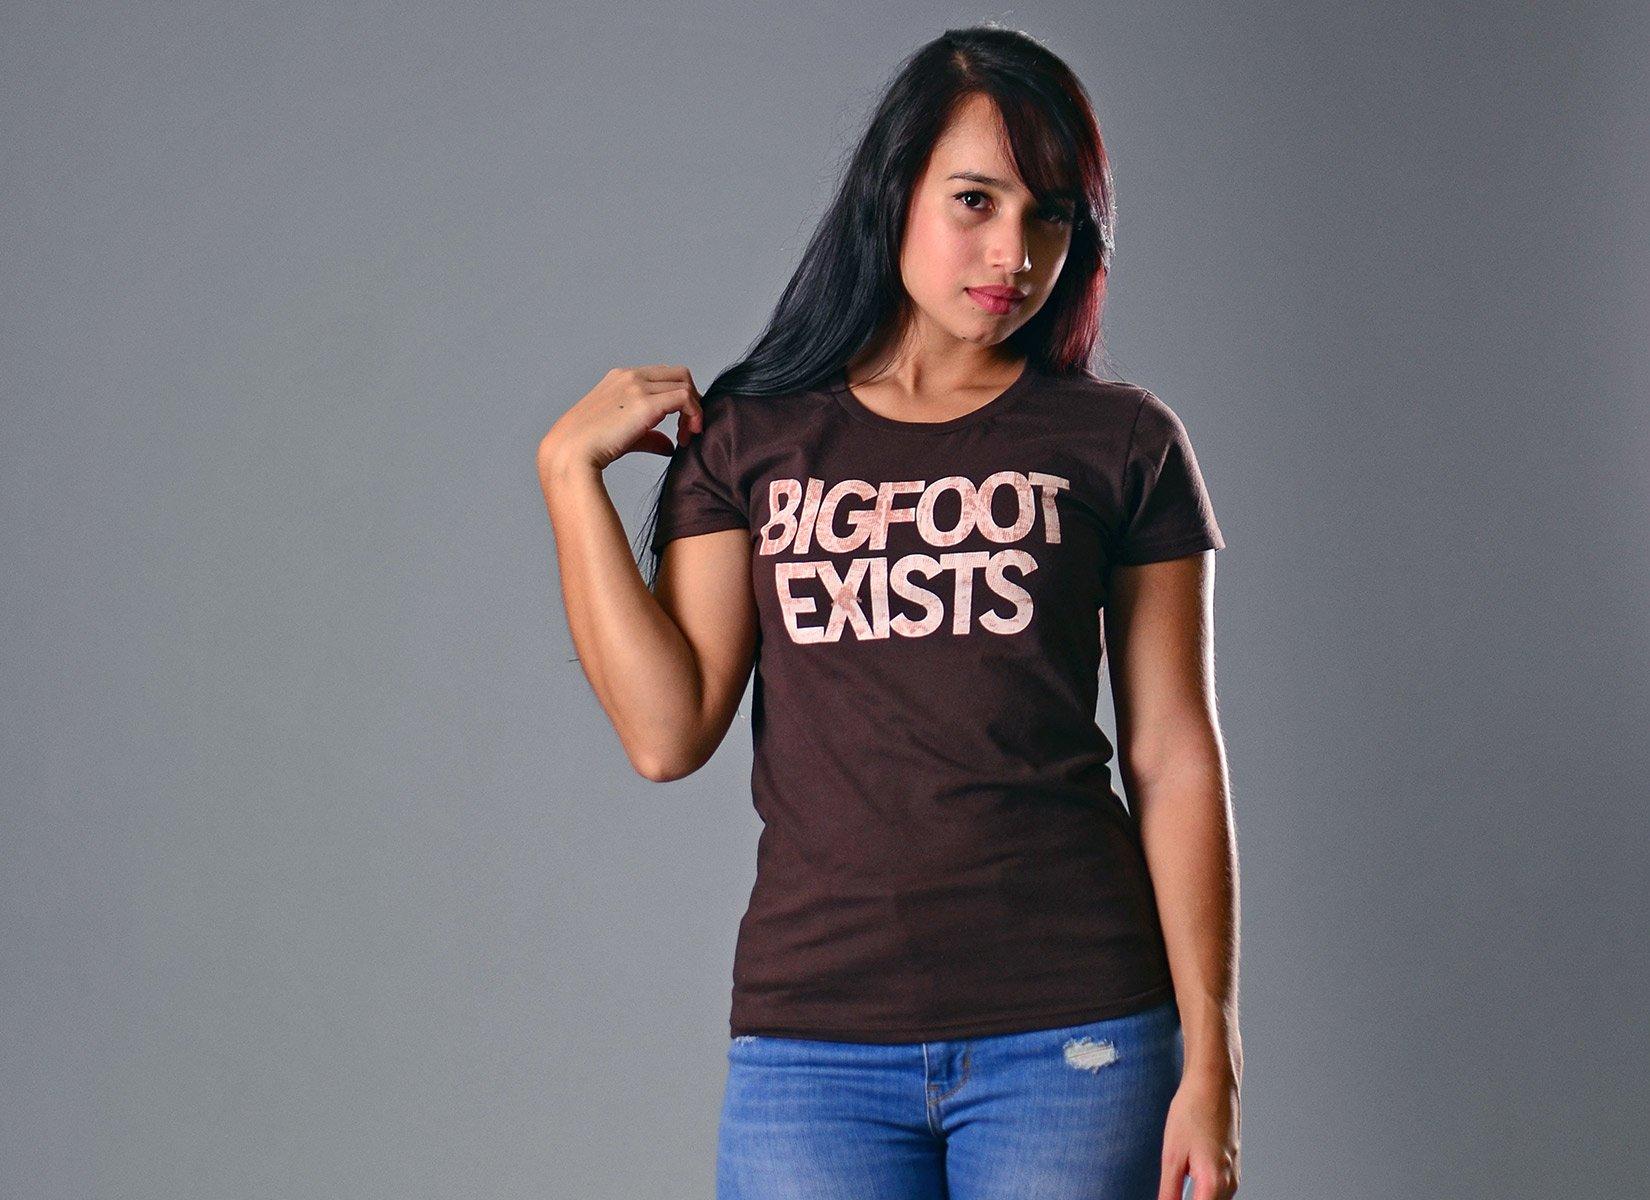 Bigfoot Exists on Womens T-Shirt